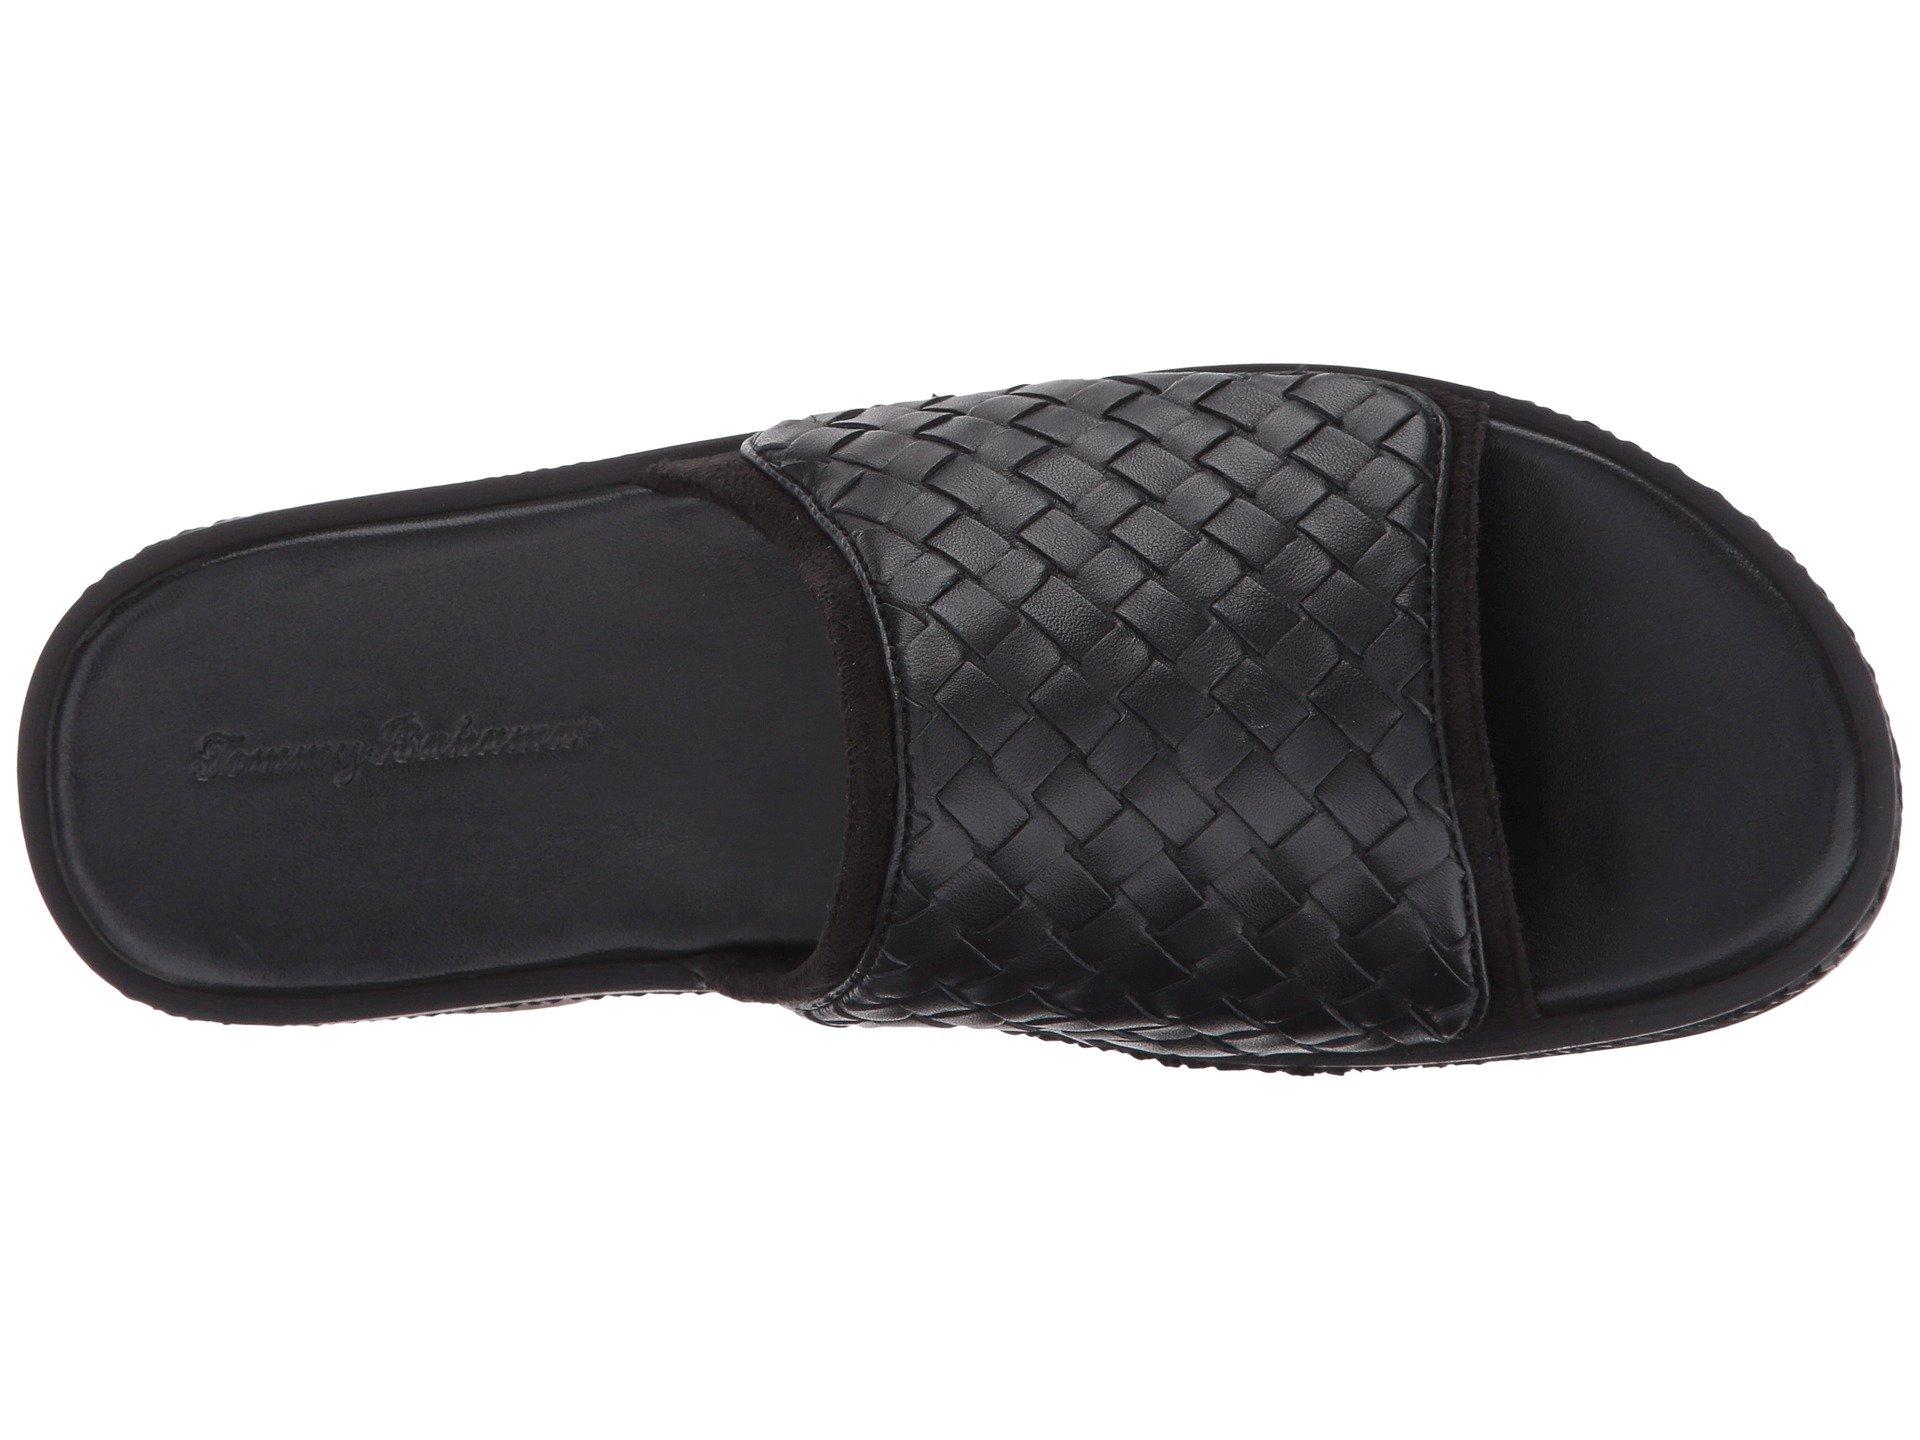 Black Slide Crest Shore Tommy Bahama Woven qxwtACnwv